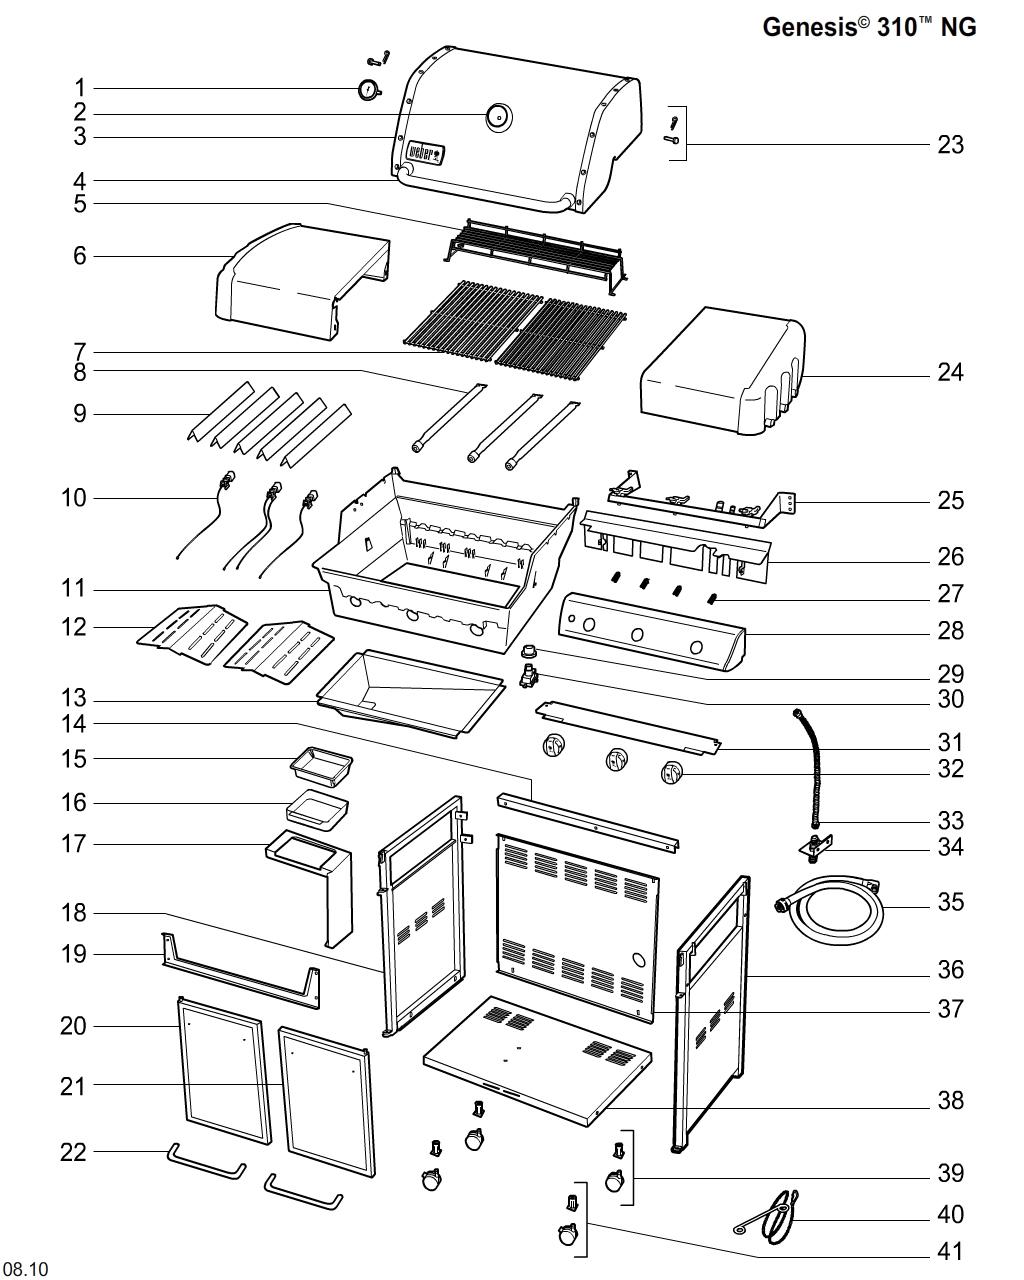 Schematic Image 6611001